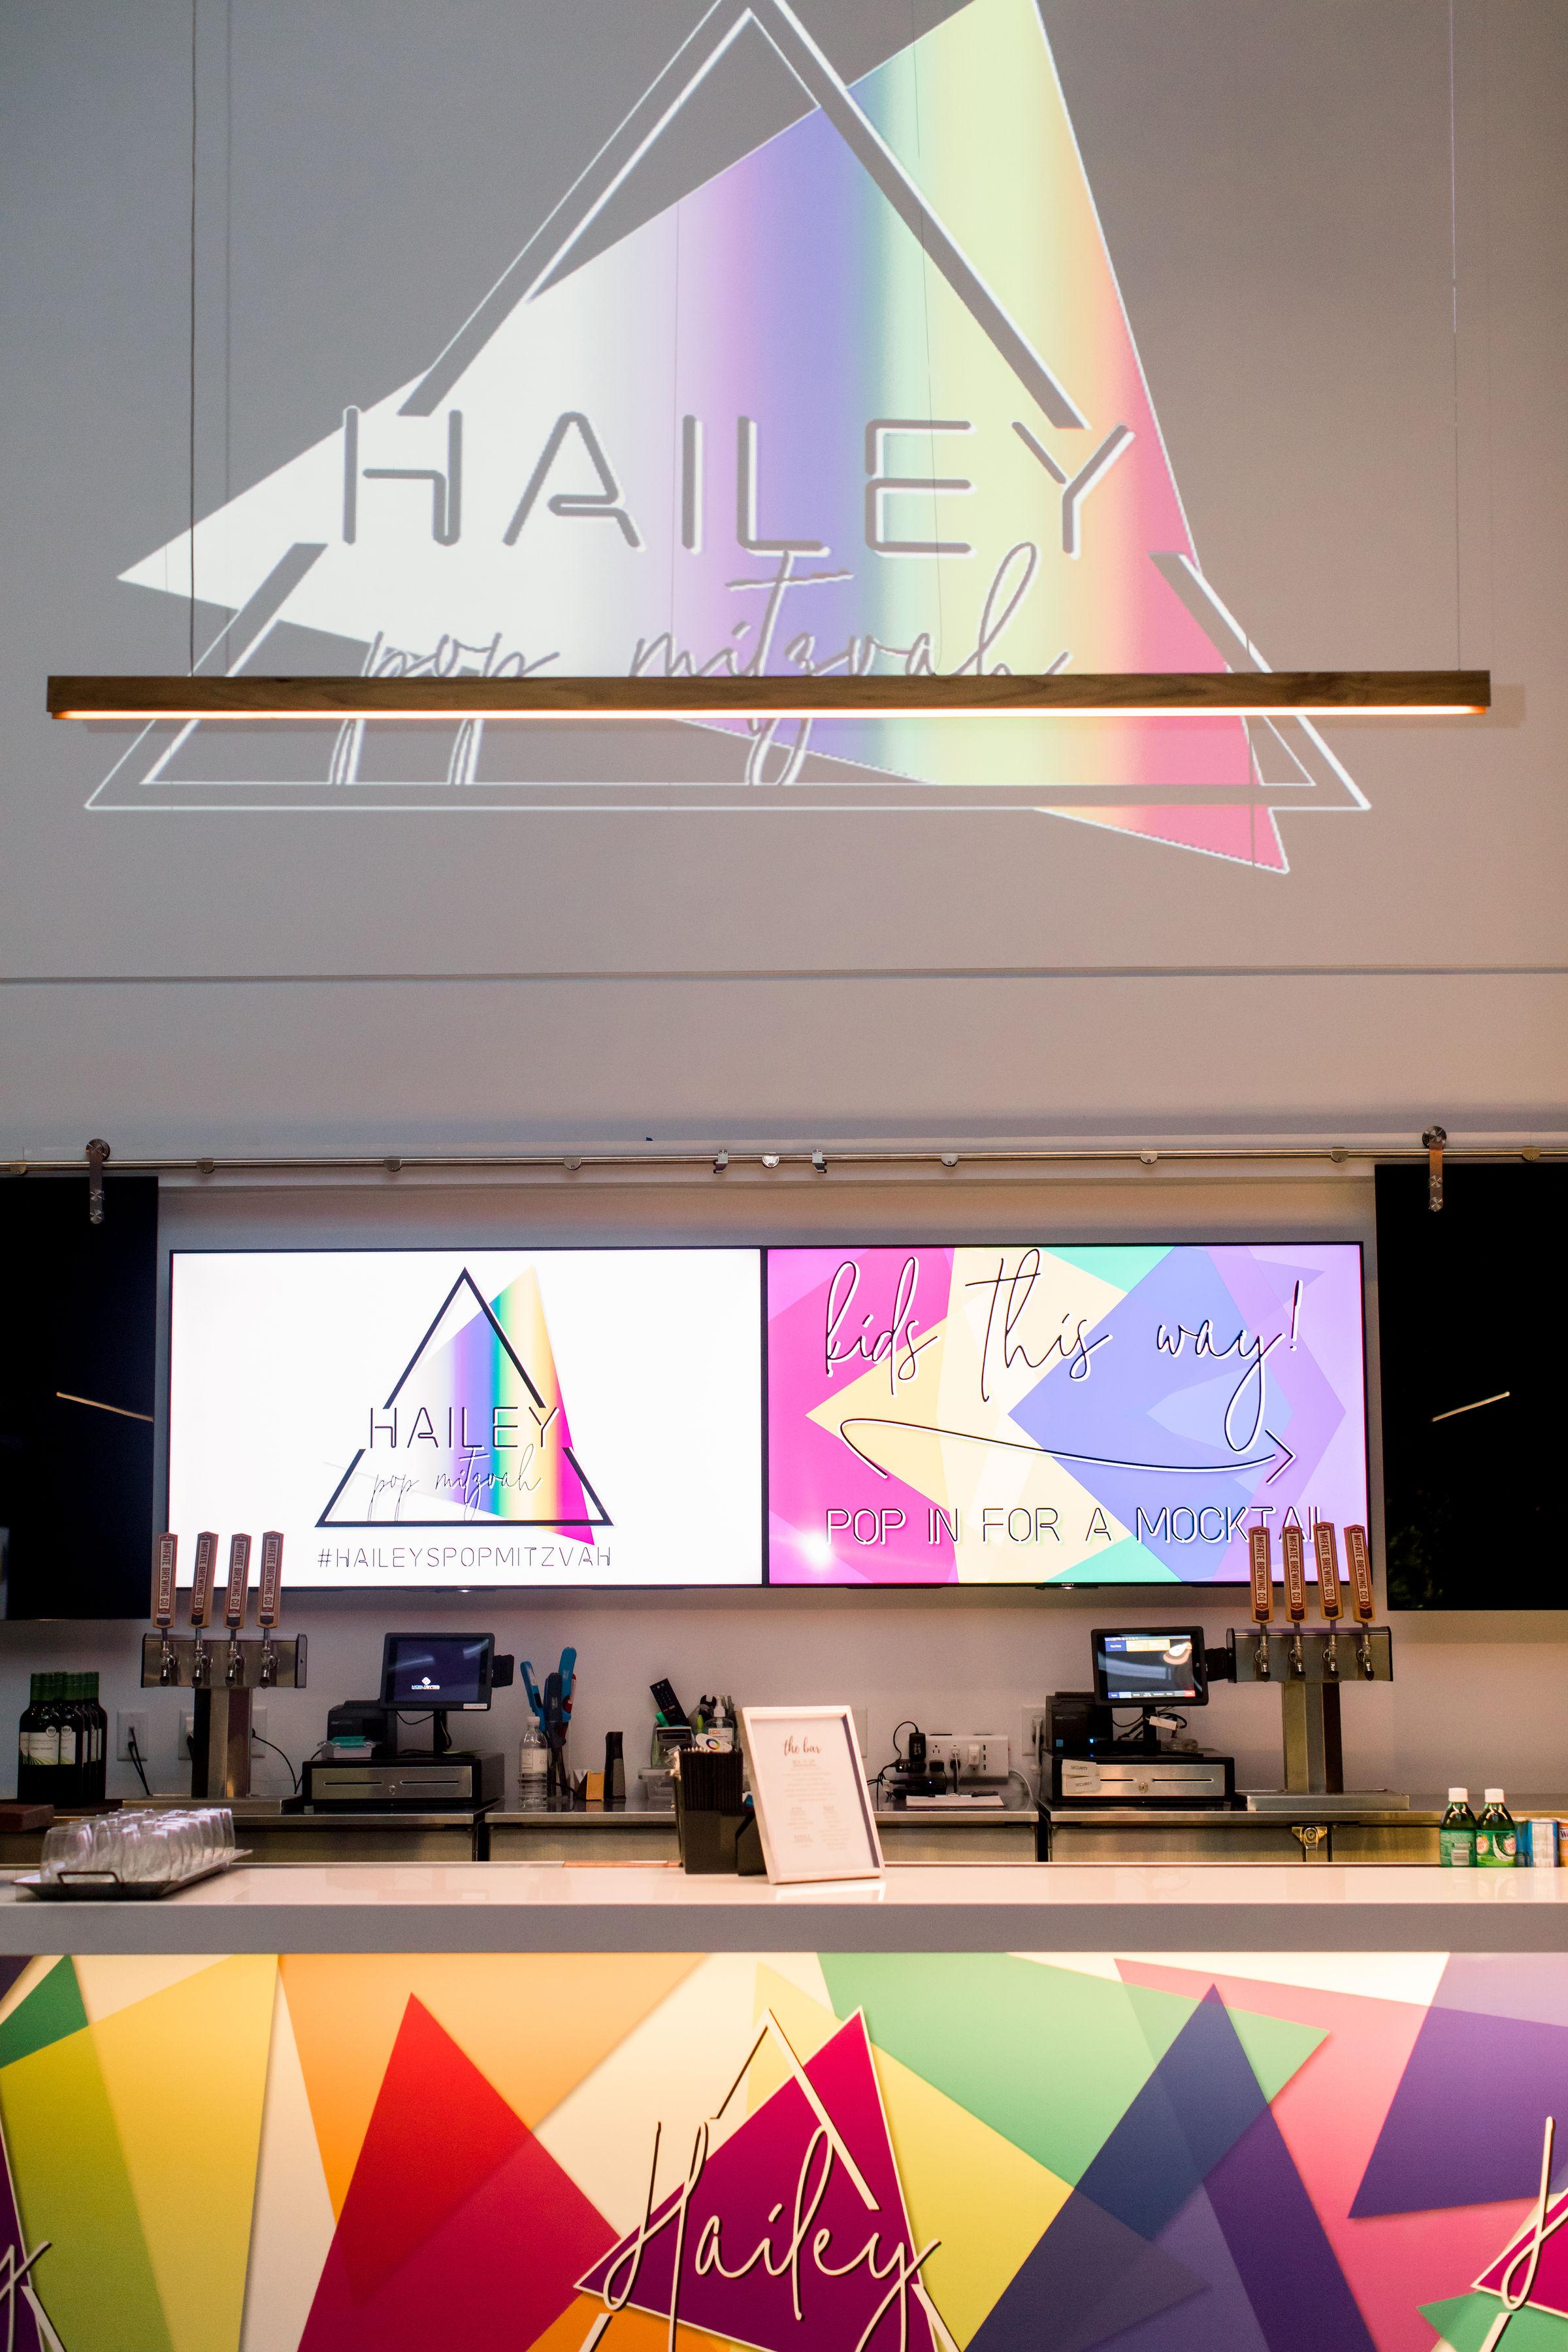 40 custom bar graphic bat mitzvah party personalized logo mocktail bar sign rainbow geometric sign rainbow bat mitzvah custom light projection Life Design Events photos by Stephanie Heymann Photography.jpg